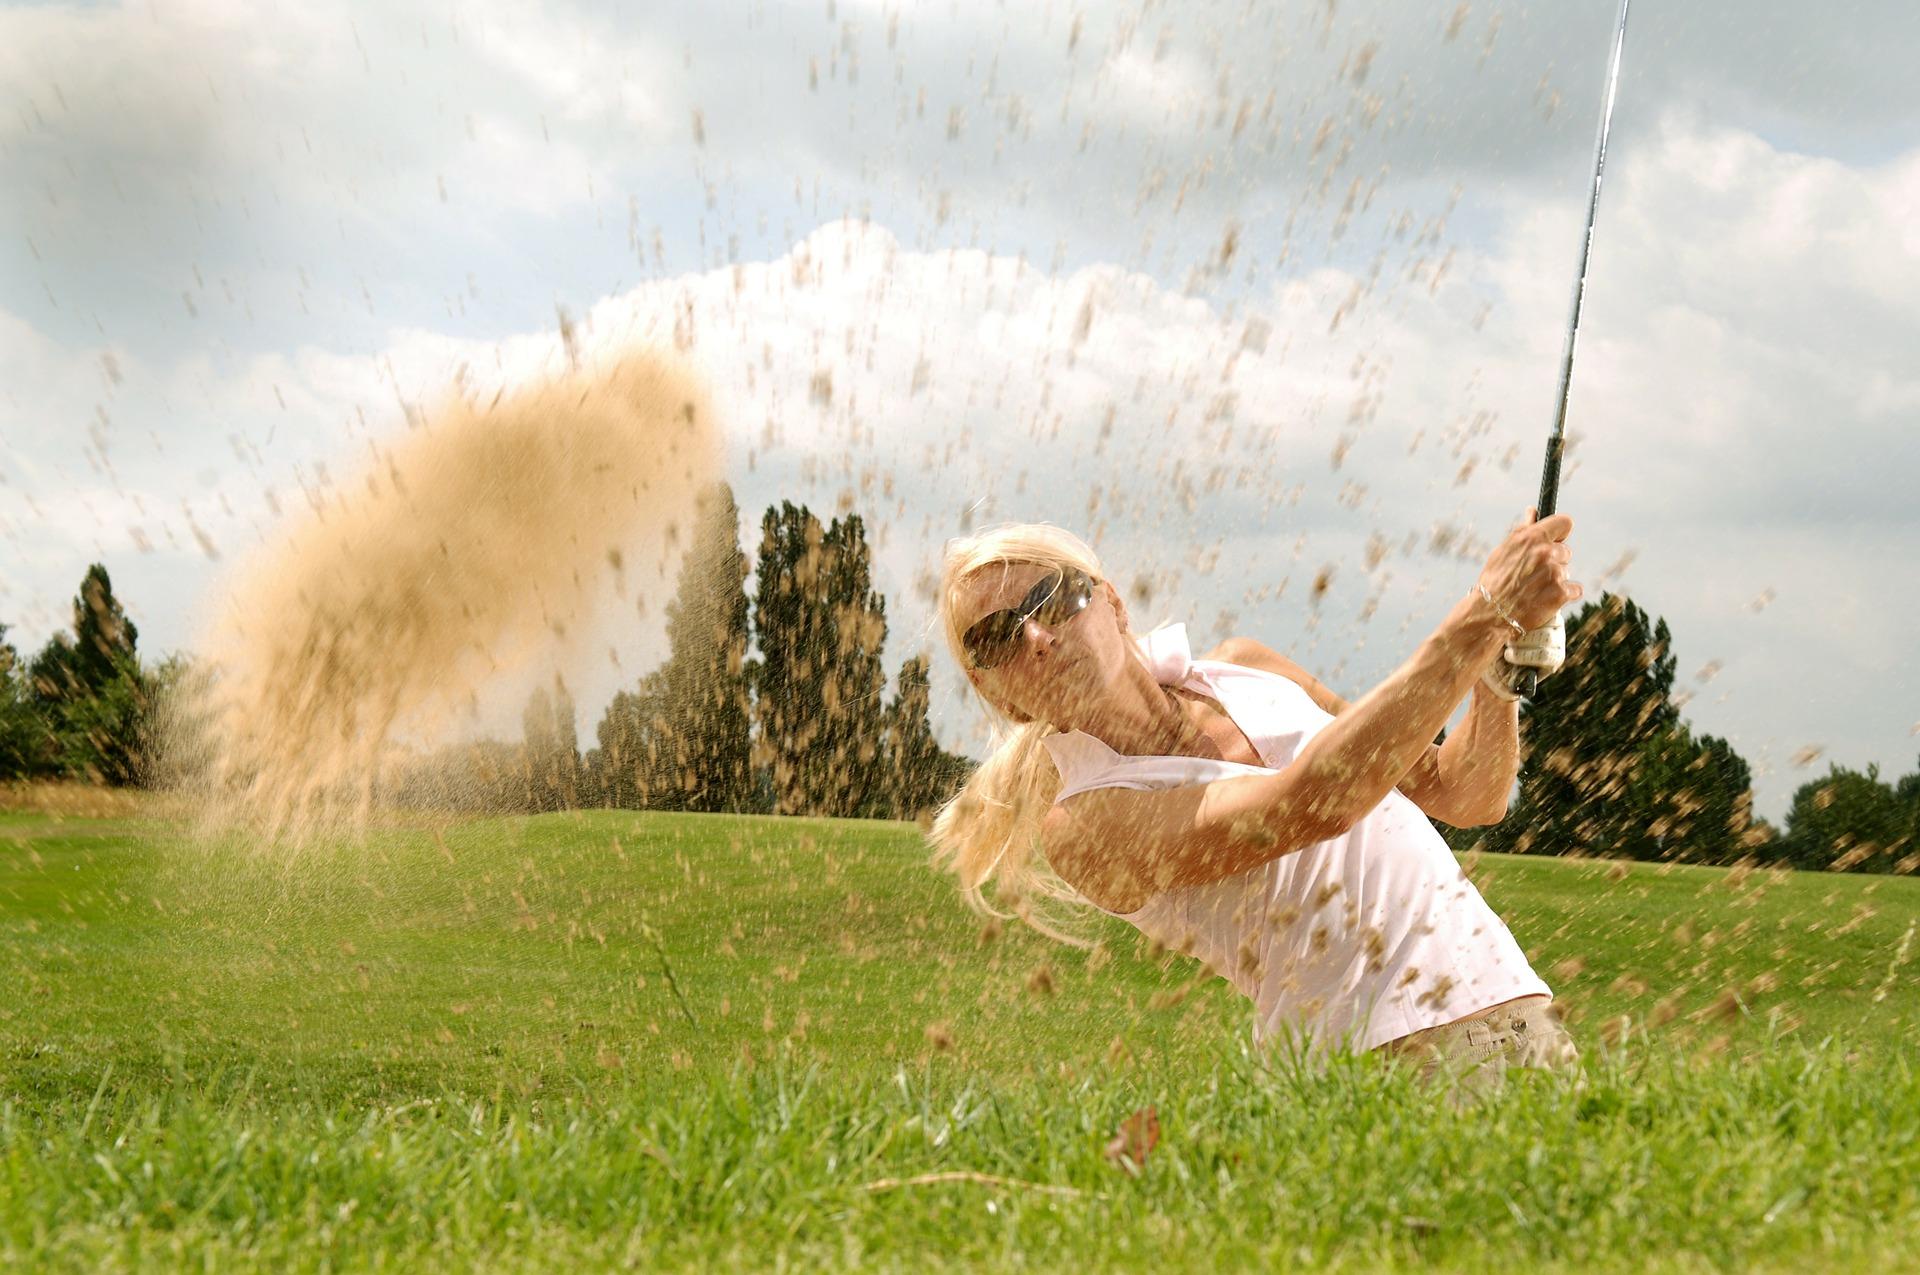 golf-83869_1920